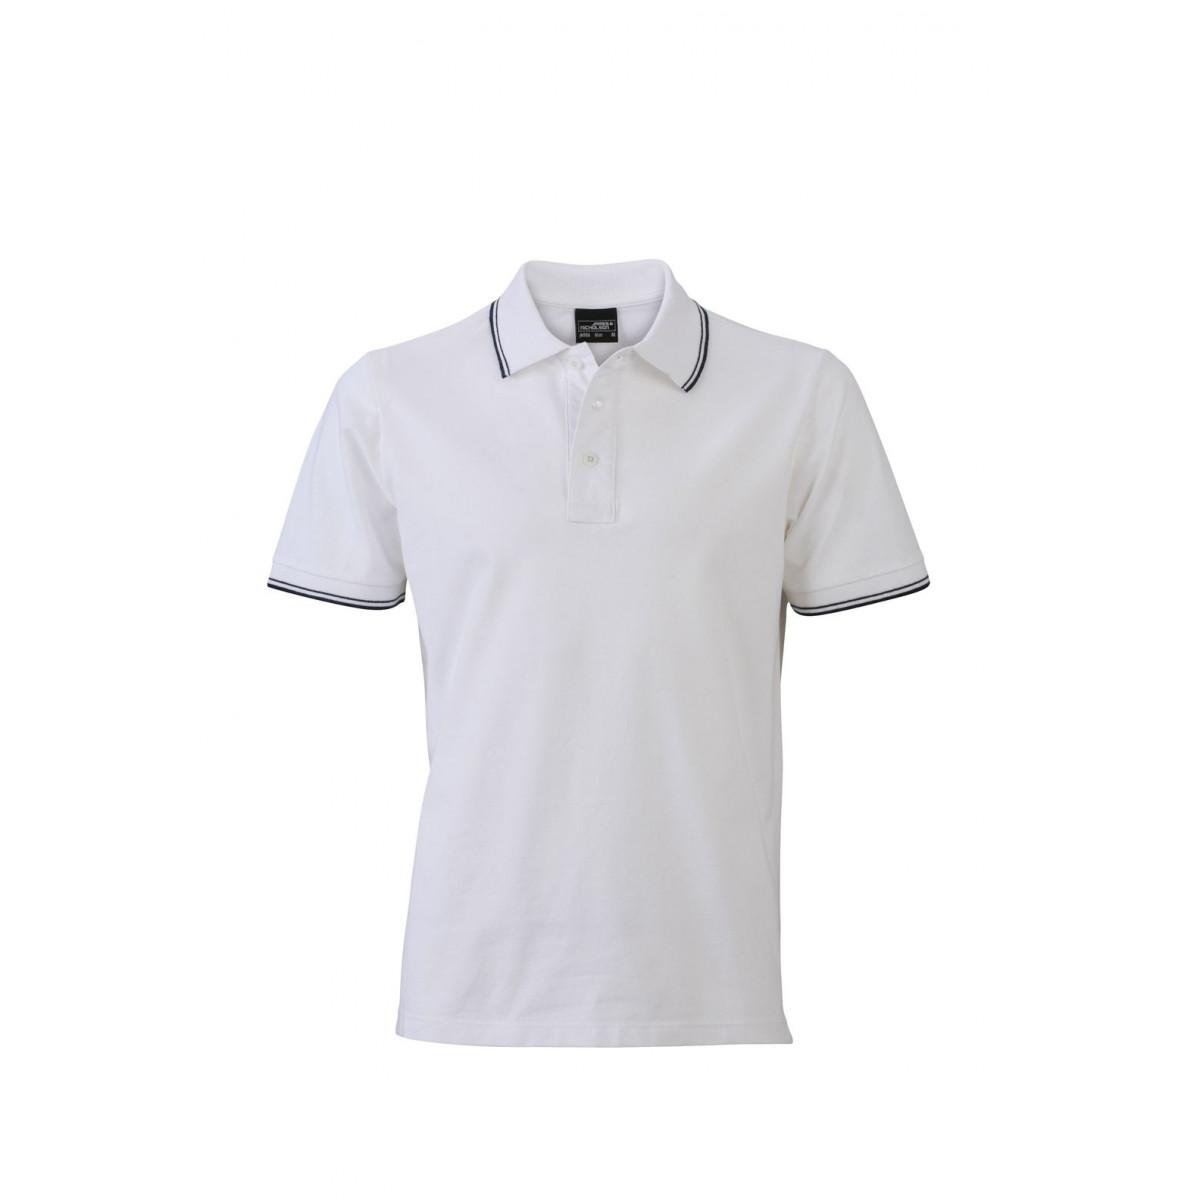 Рубашка поло мужская JN986 Mens Polo - Белый/Темно-синий